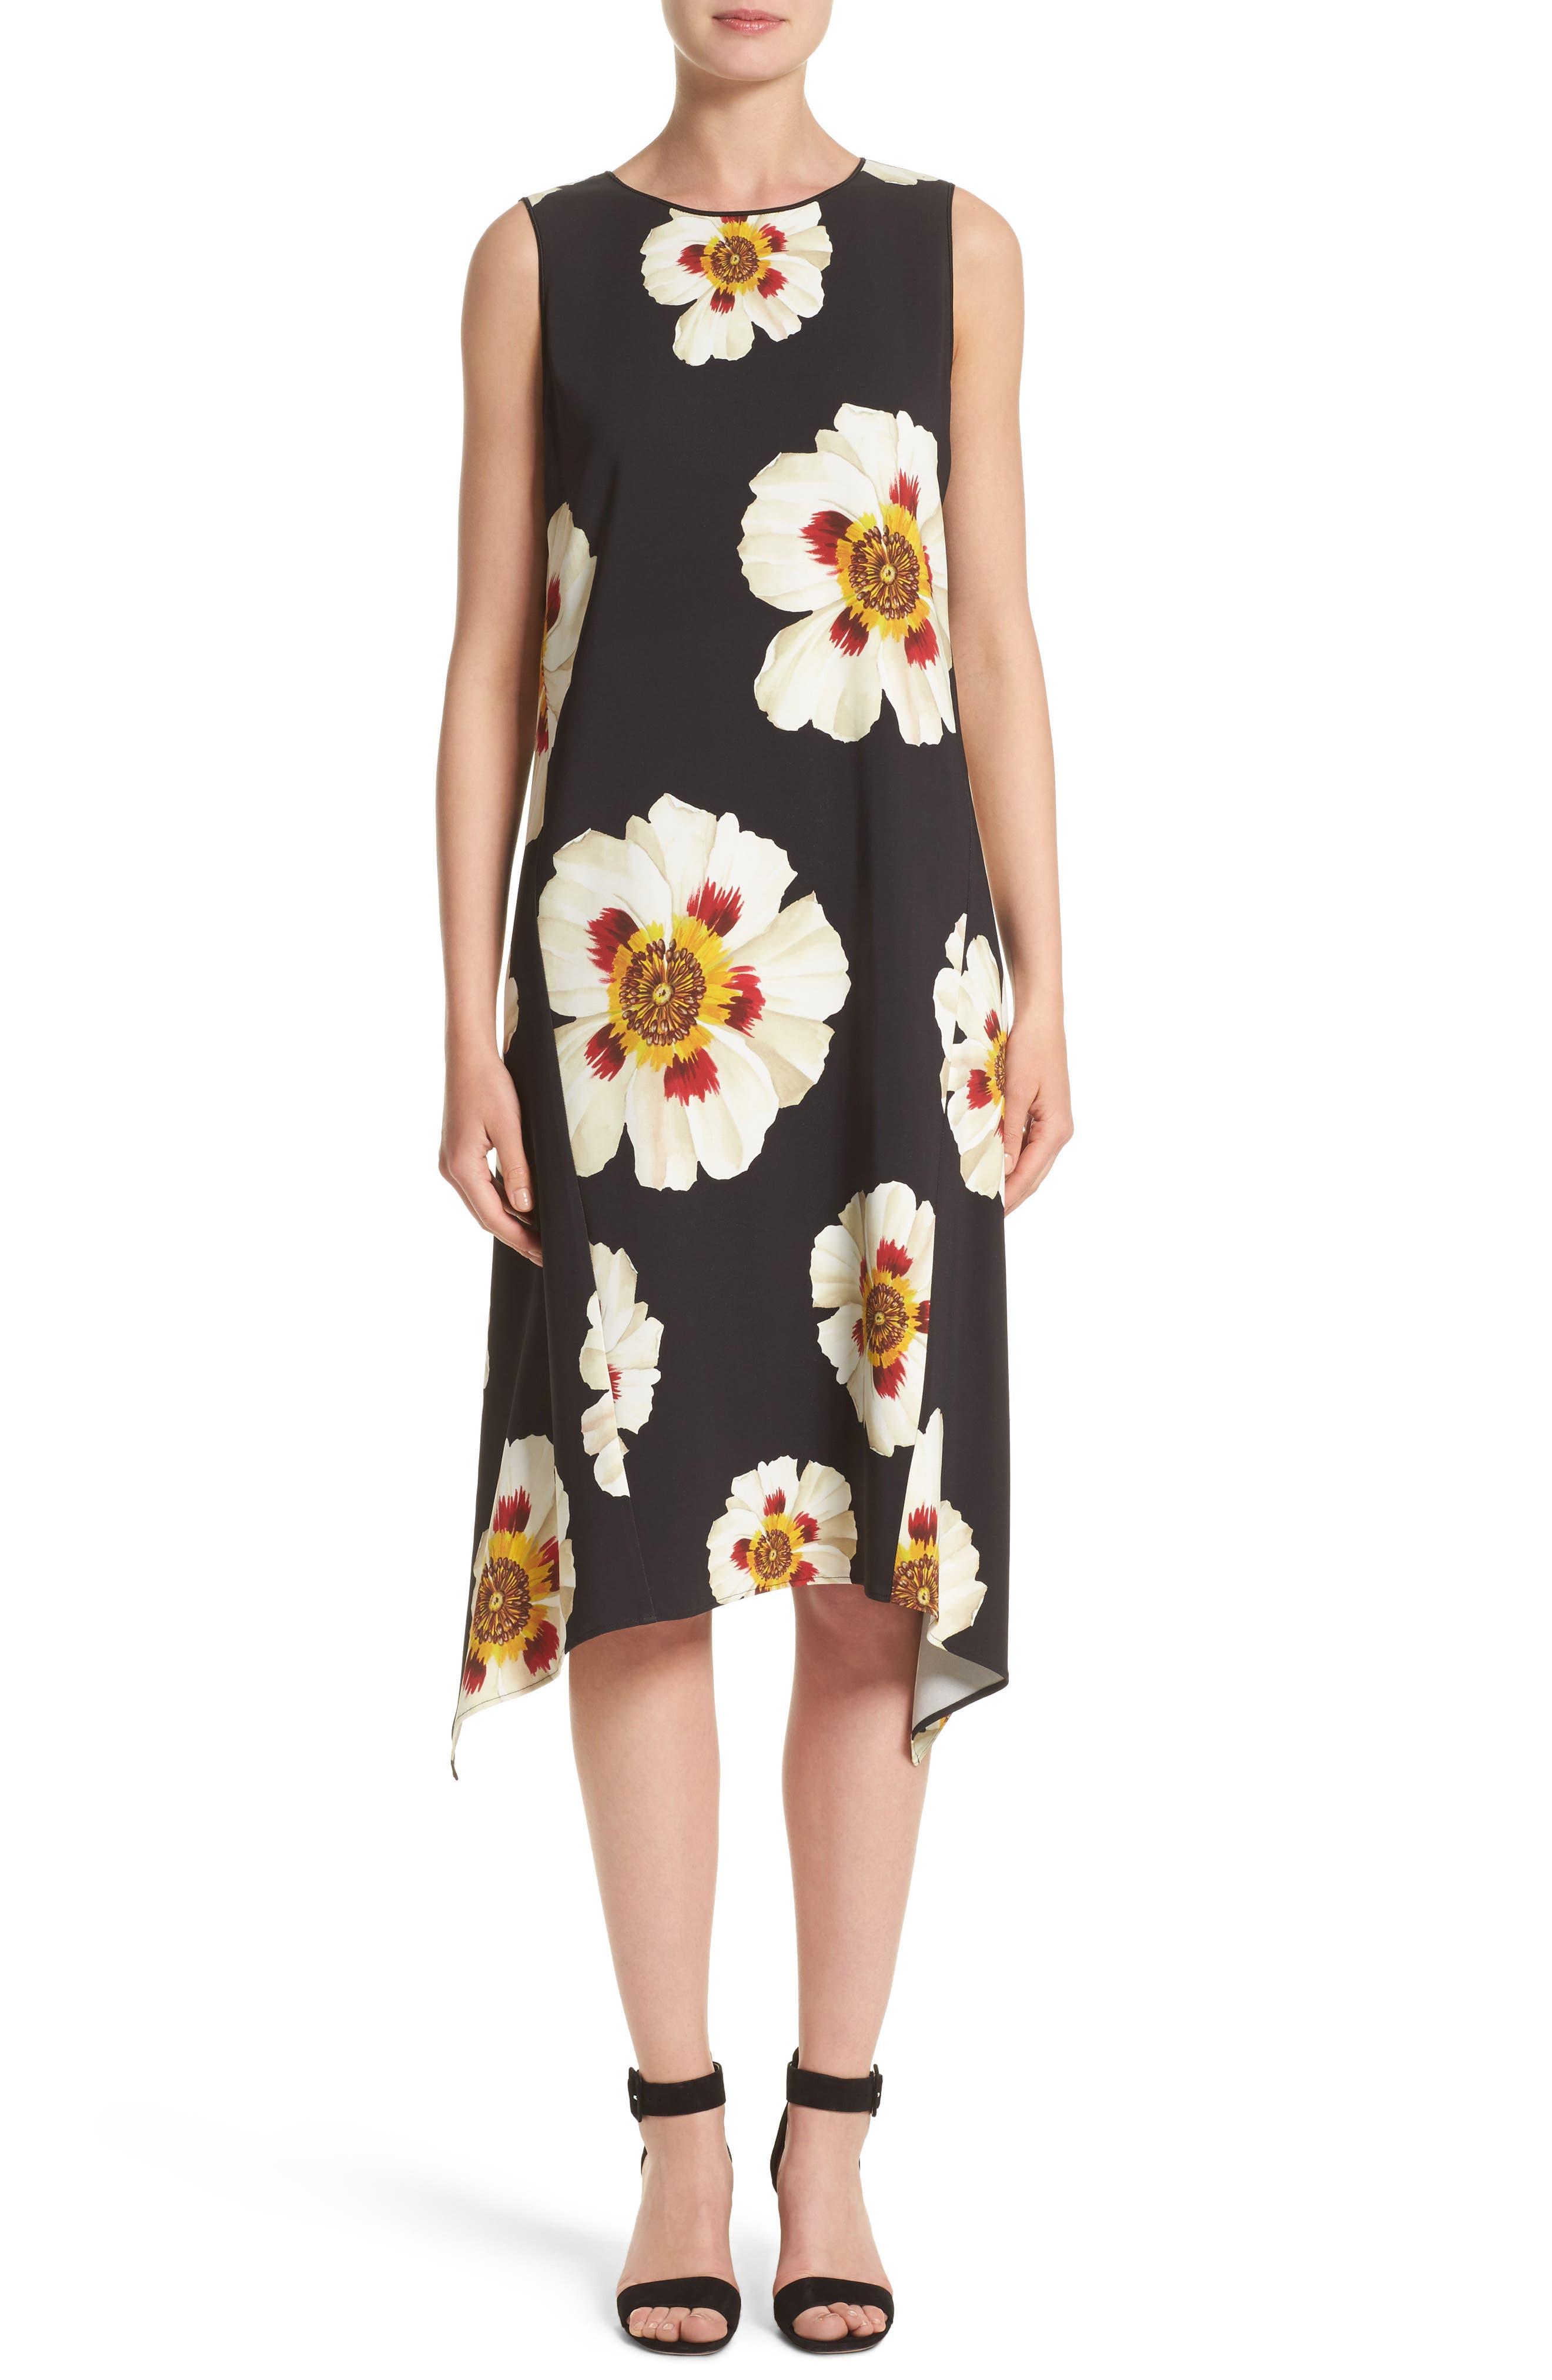 Romona Floral Fluid Cloth Dress,                         Main,                         color, Black Multi